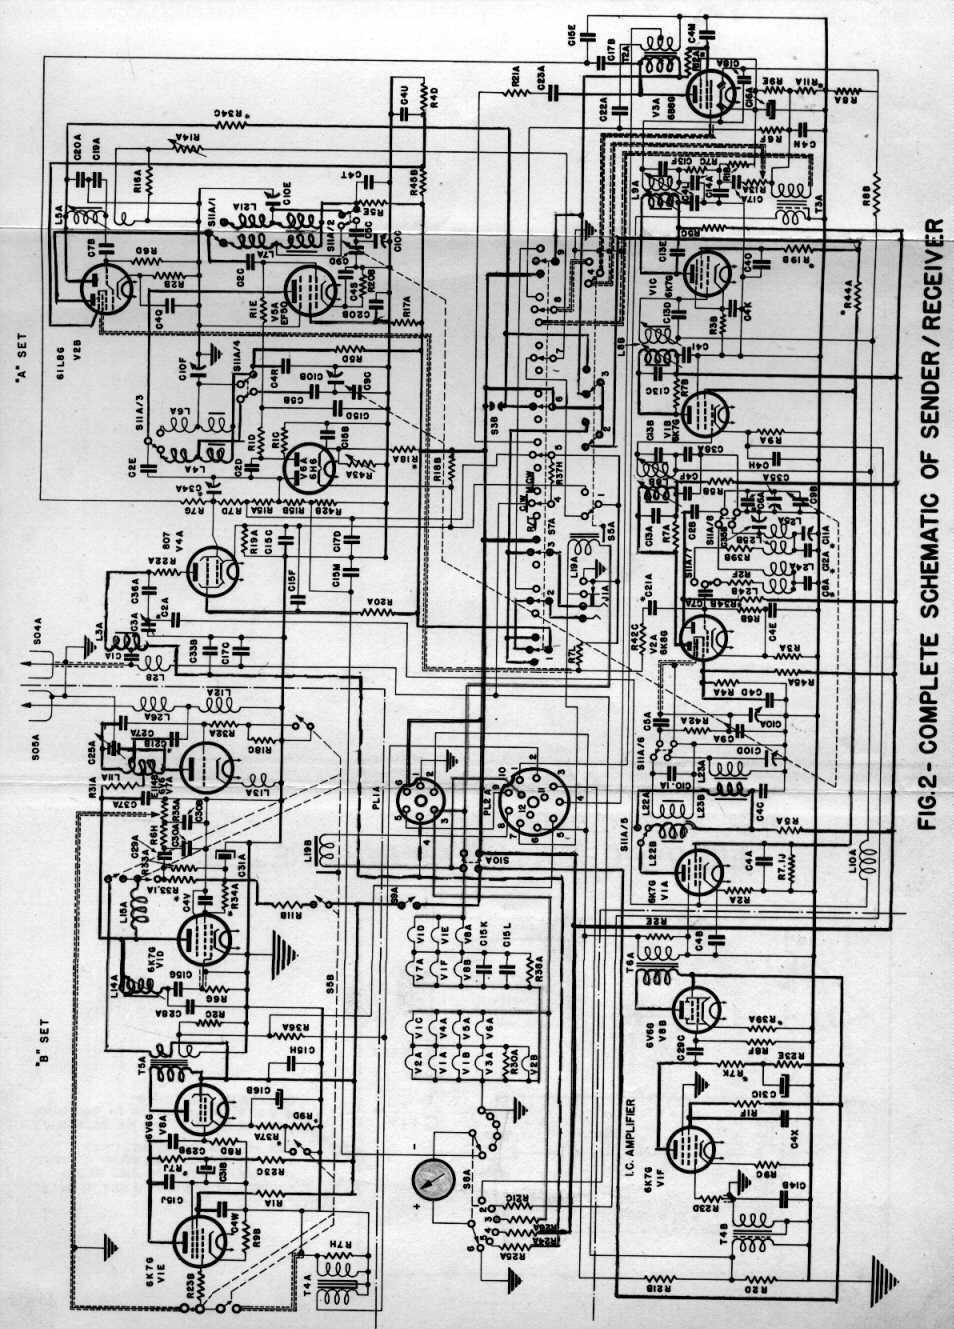 Complete Schematic of Sender/Receiver, ...